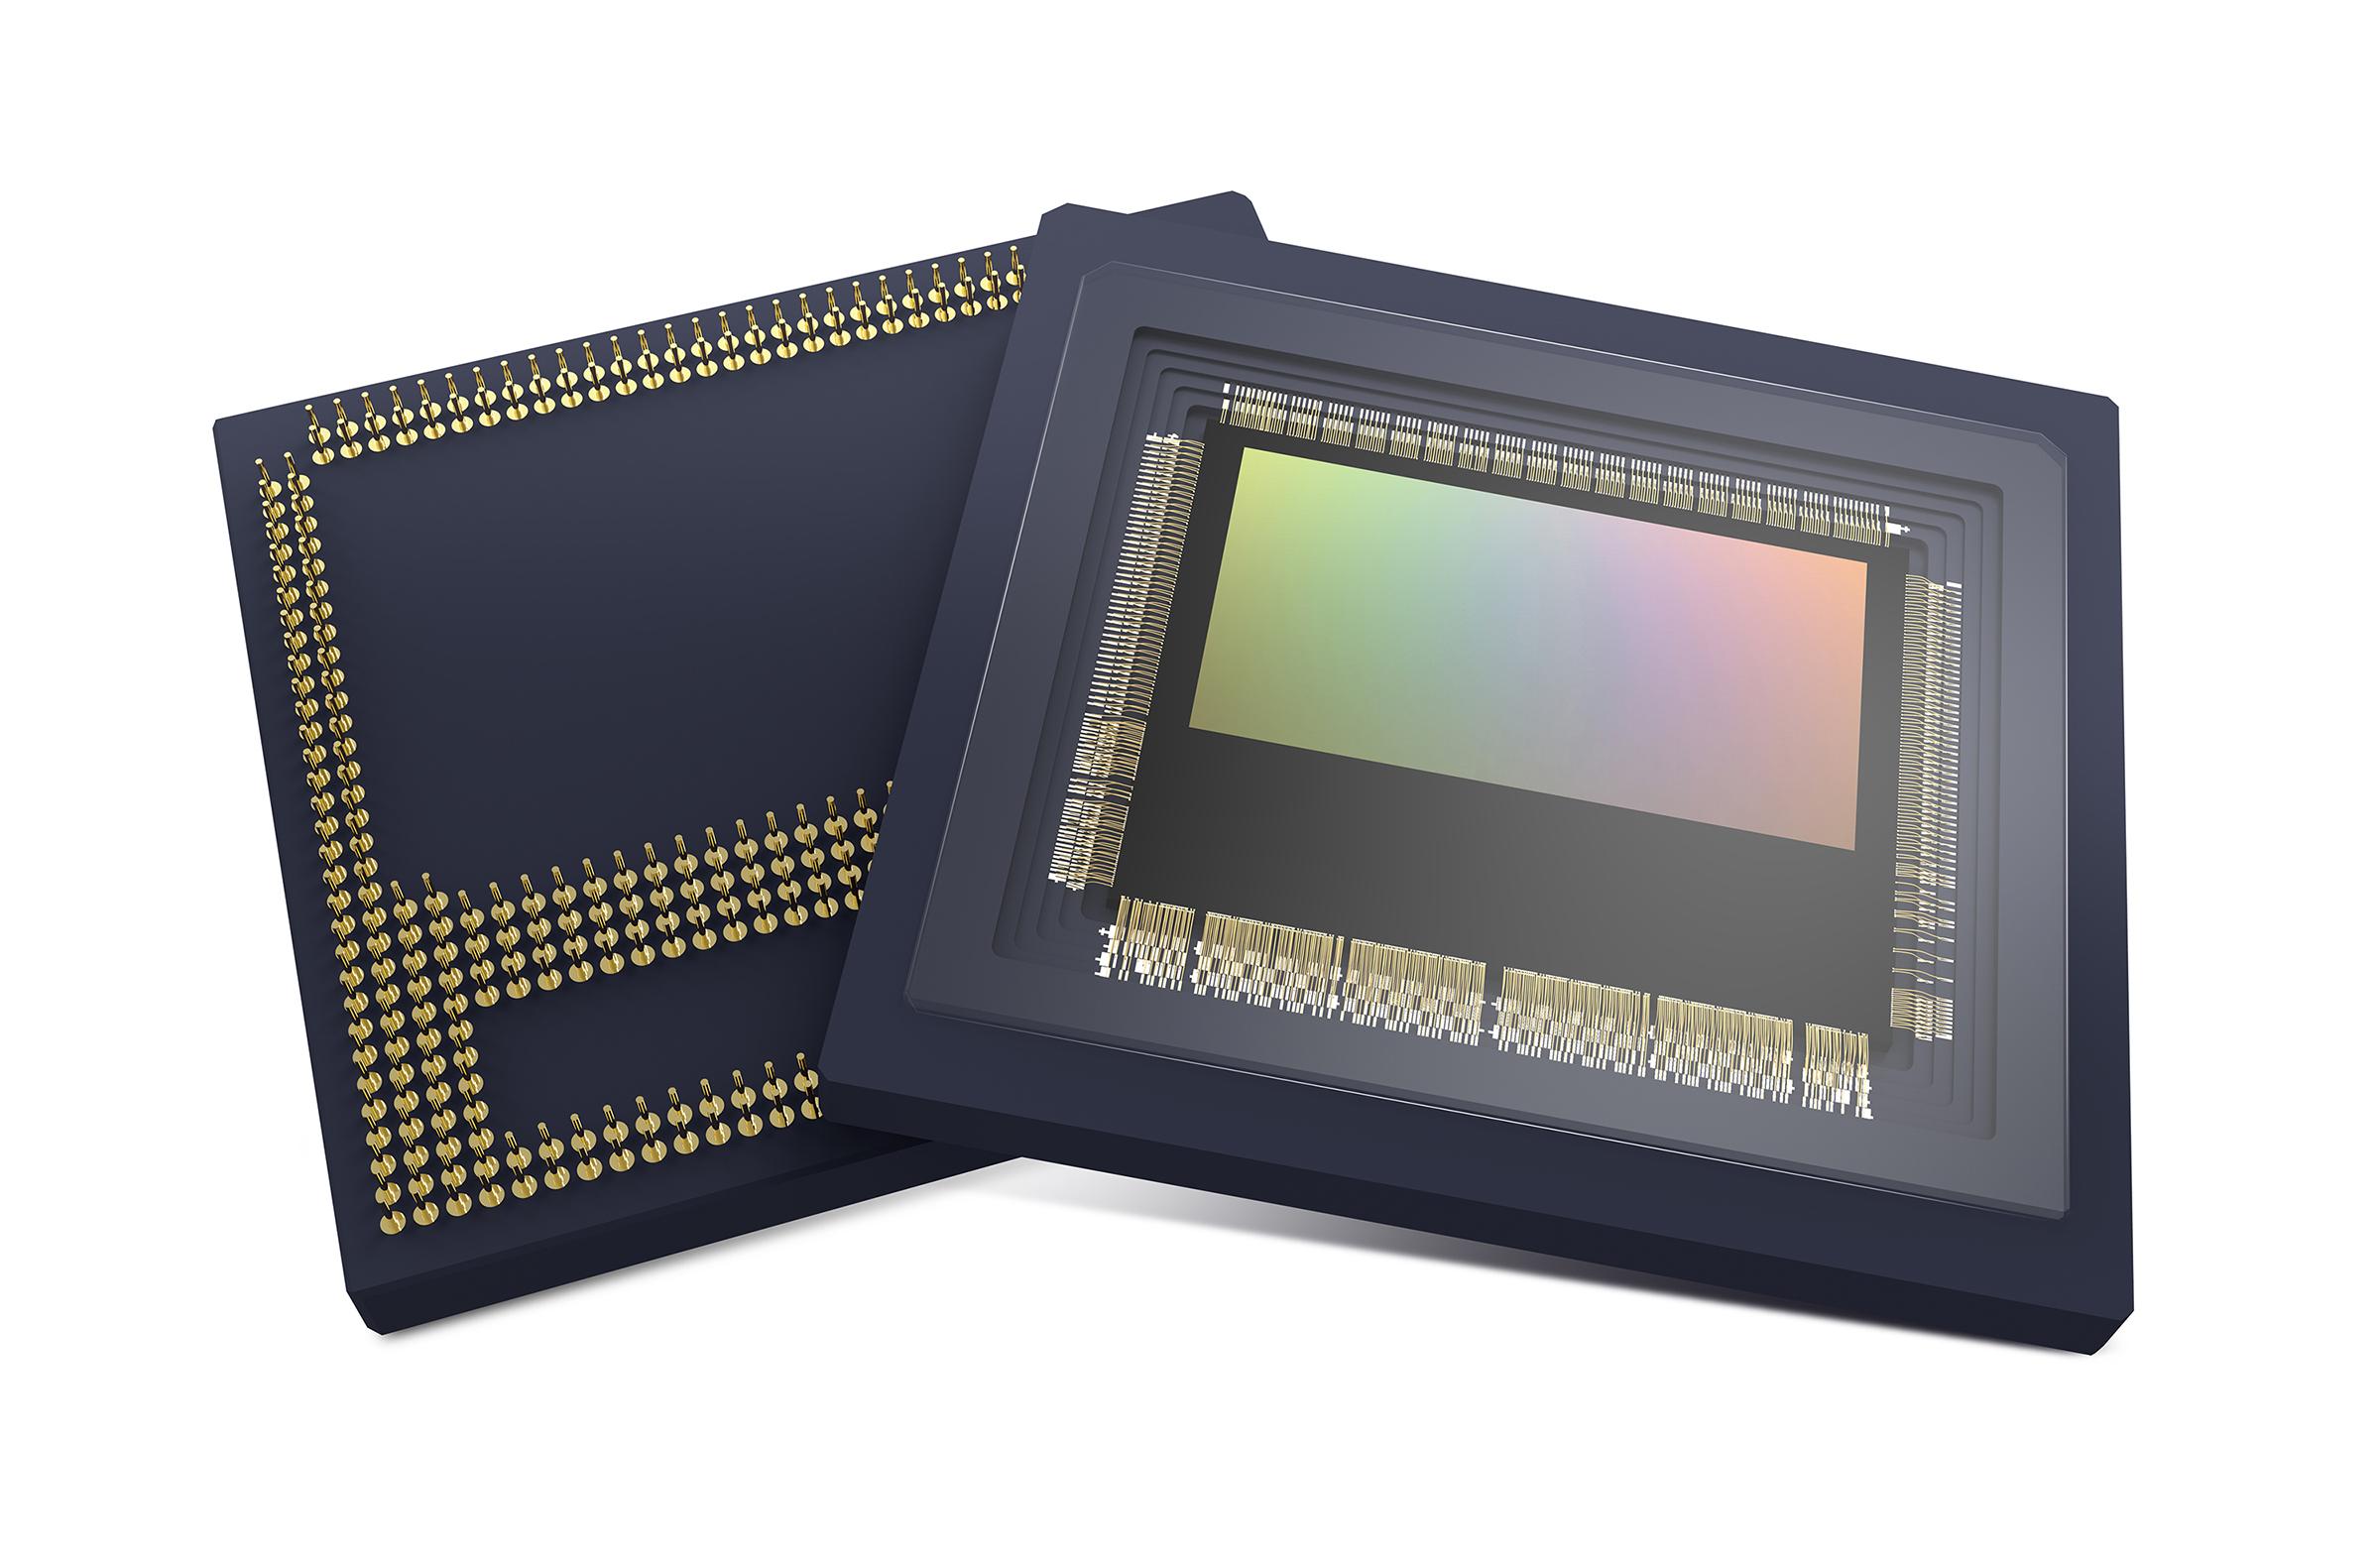 Teledyne e2v's Lince11M image sensor